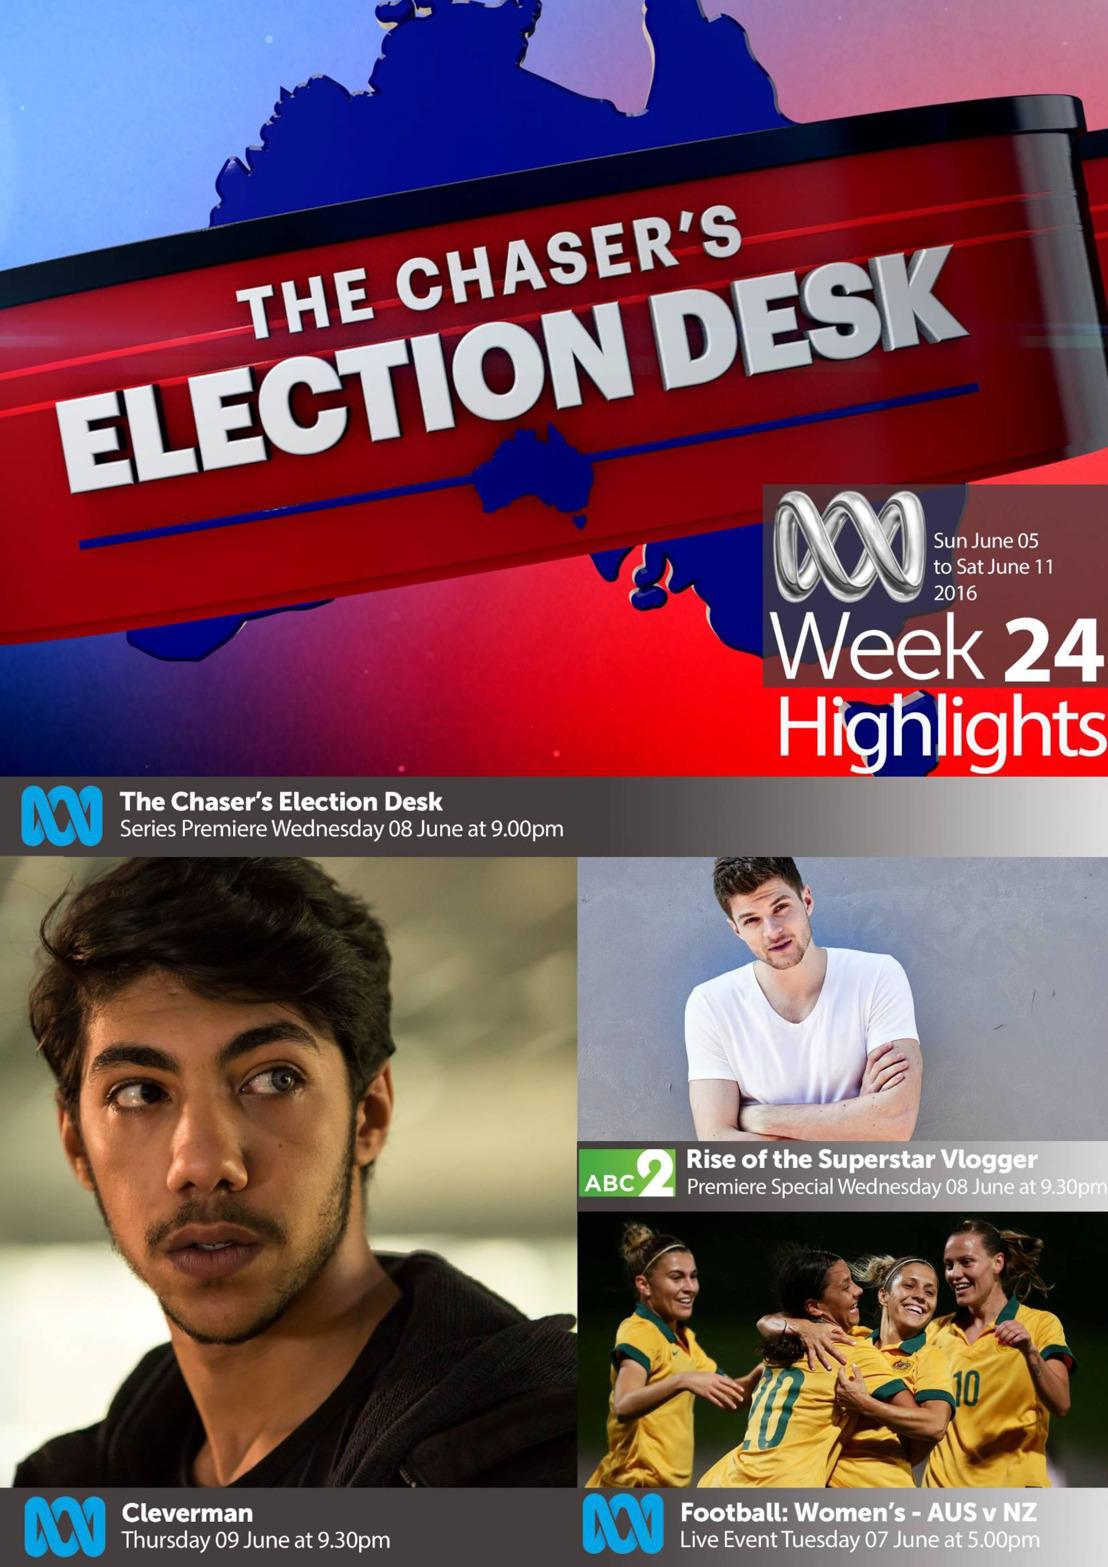 ABC Program Highlights - Week 24